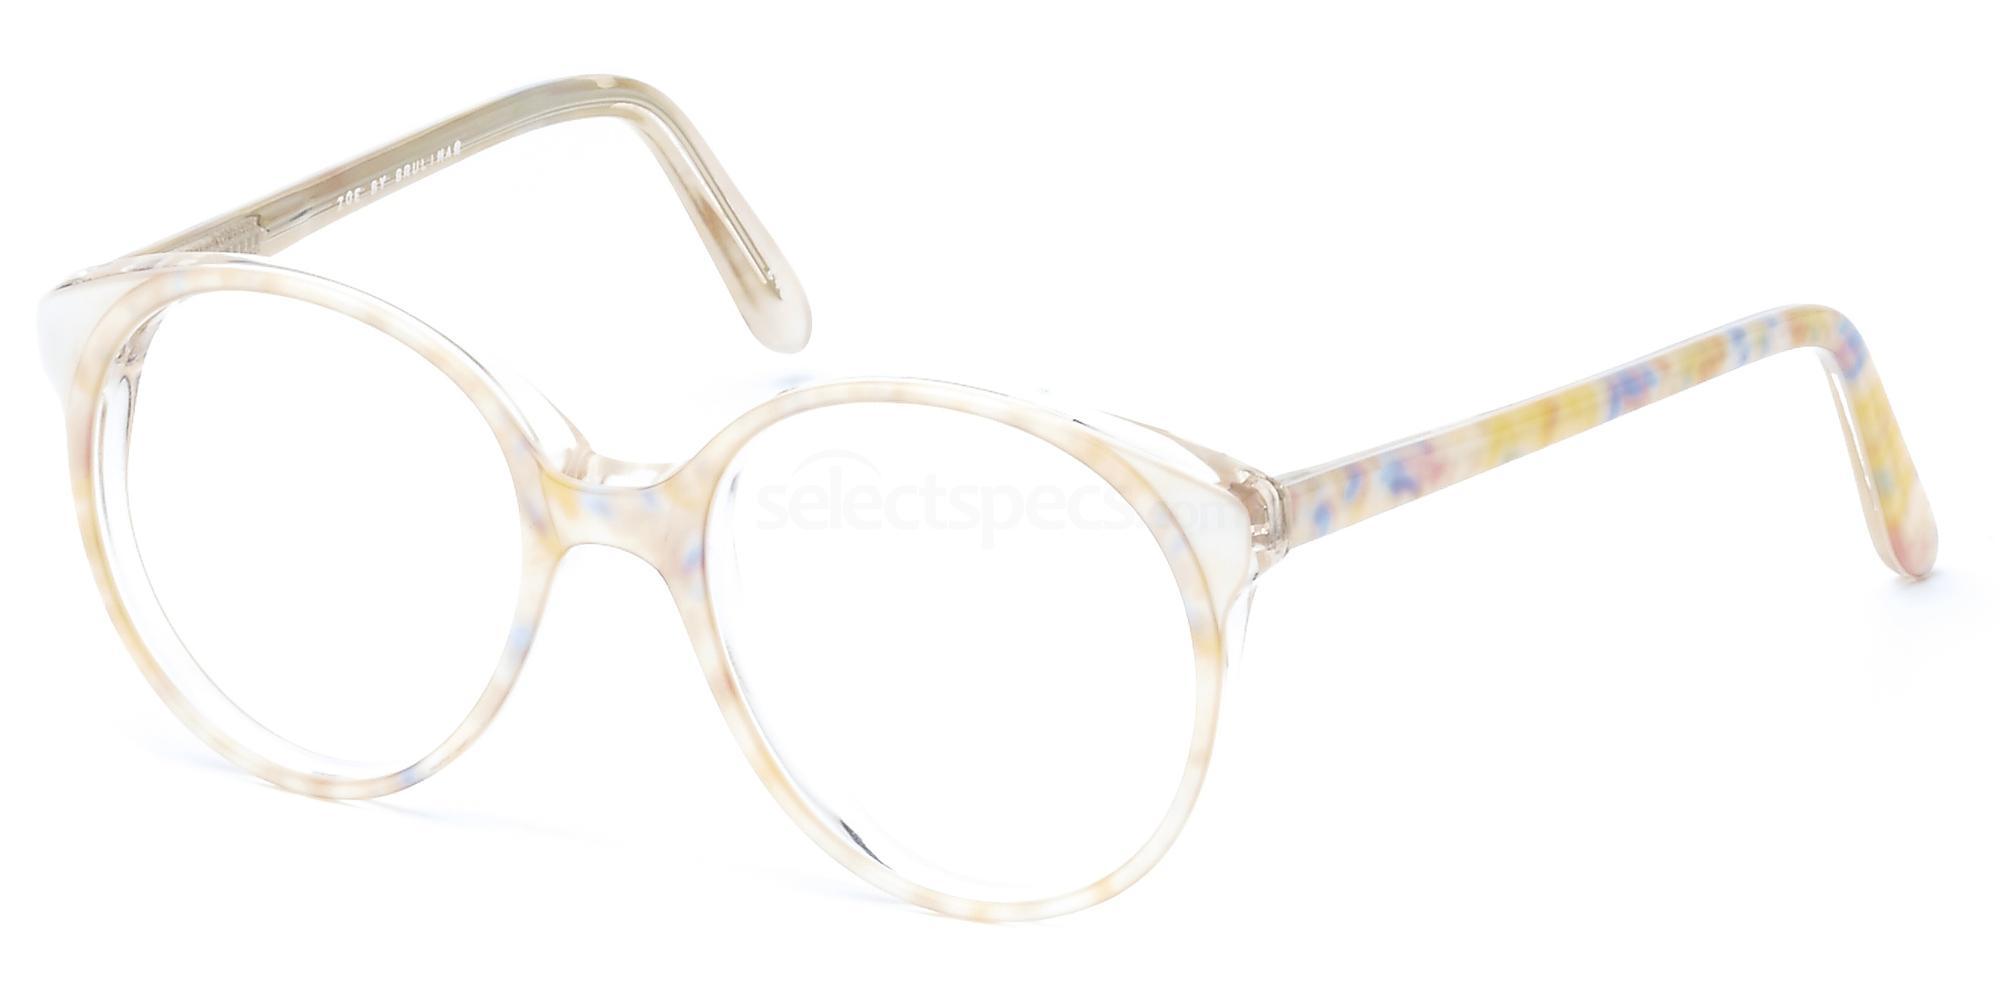 C243 ZOE2243 Glasses, Zoe Vintage